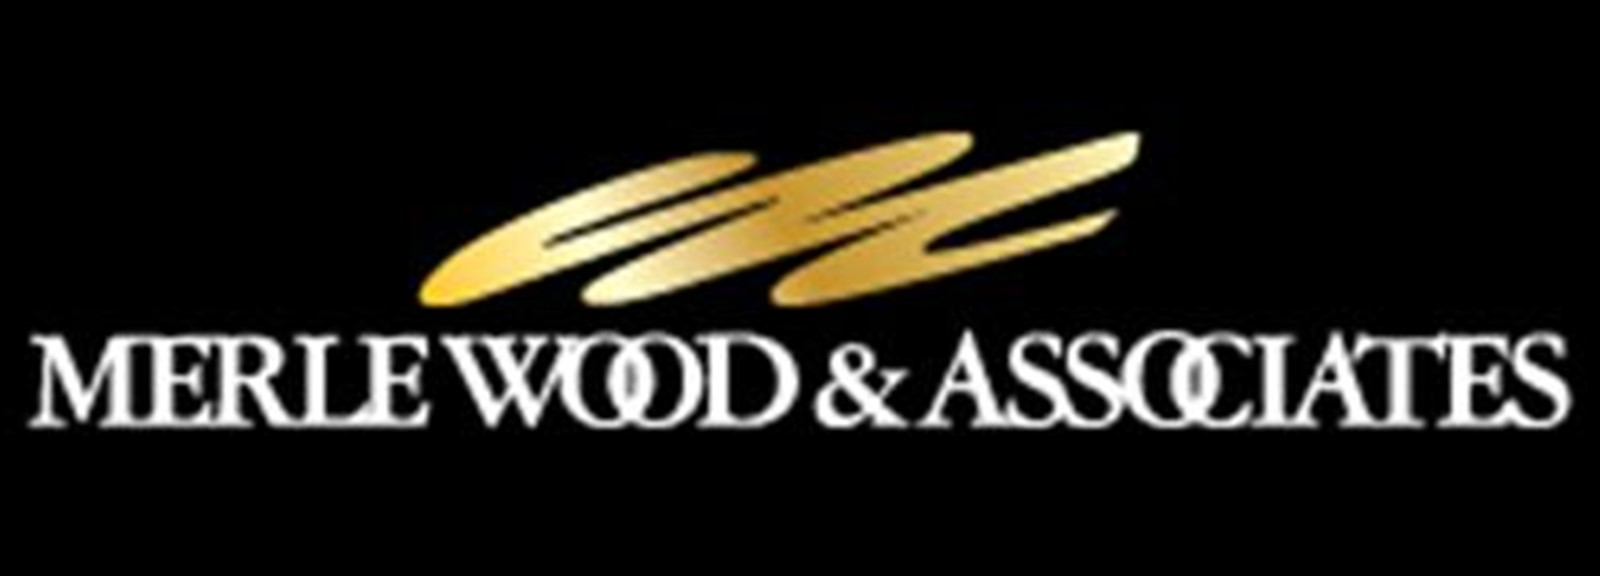 Merle Wood & Associates, Inc.